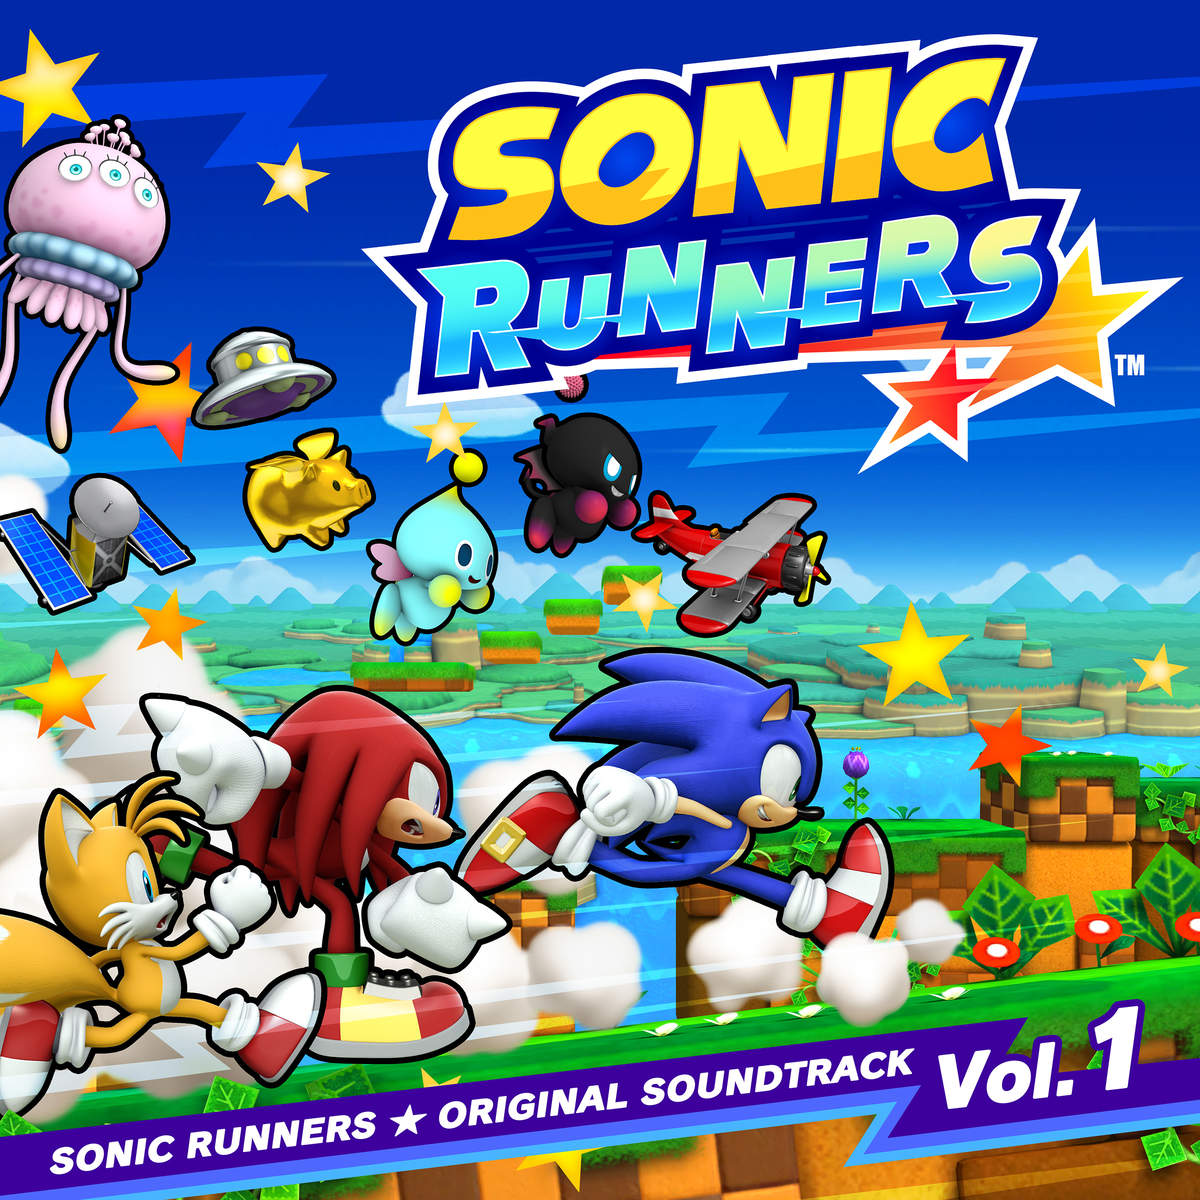 Sonic_Runners_Original_Soundtrack_Vol._1__cover1200x1200.jpg